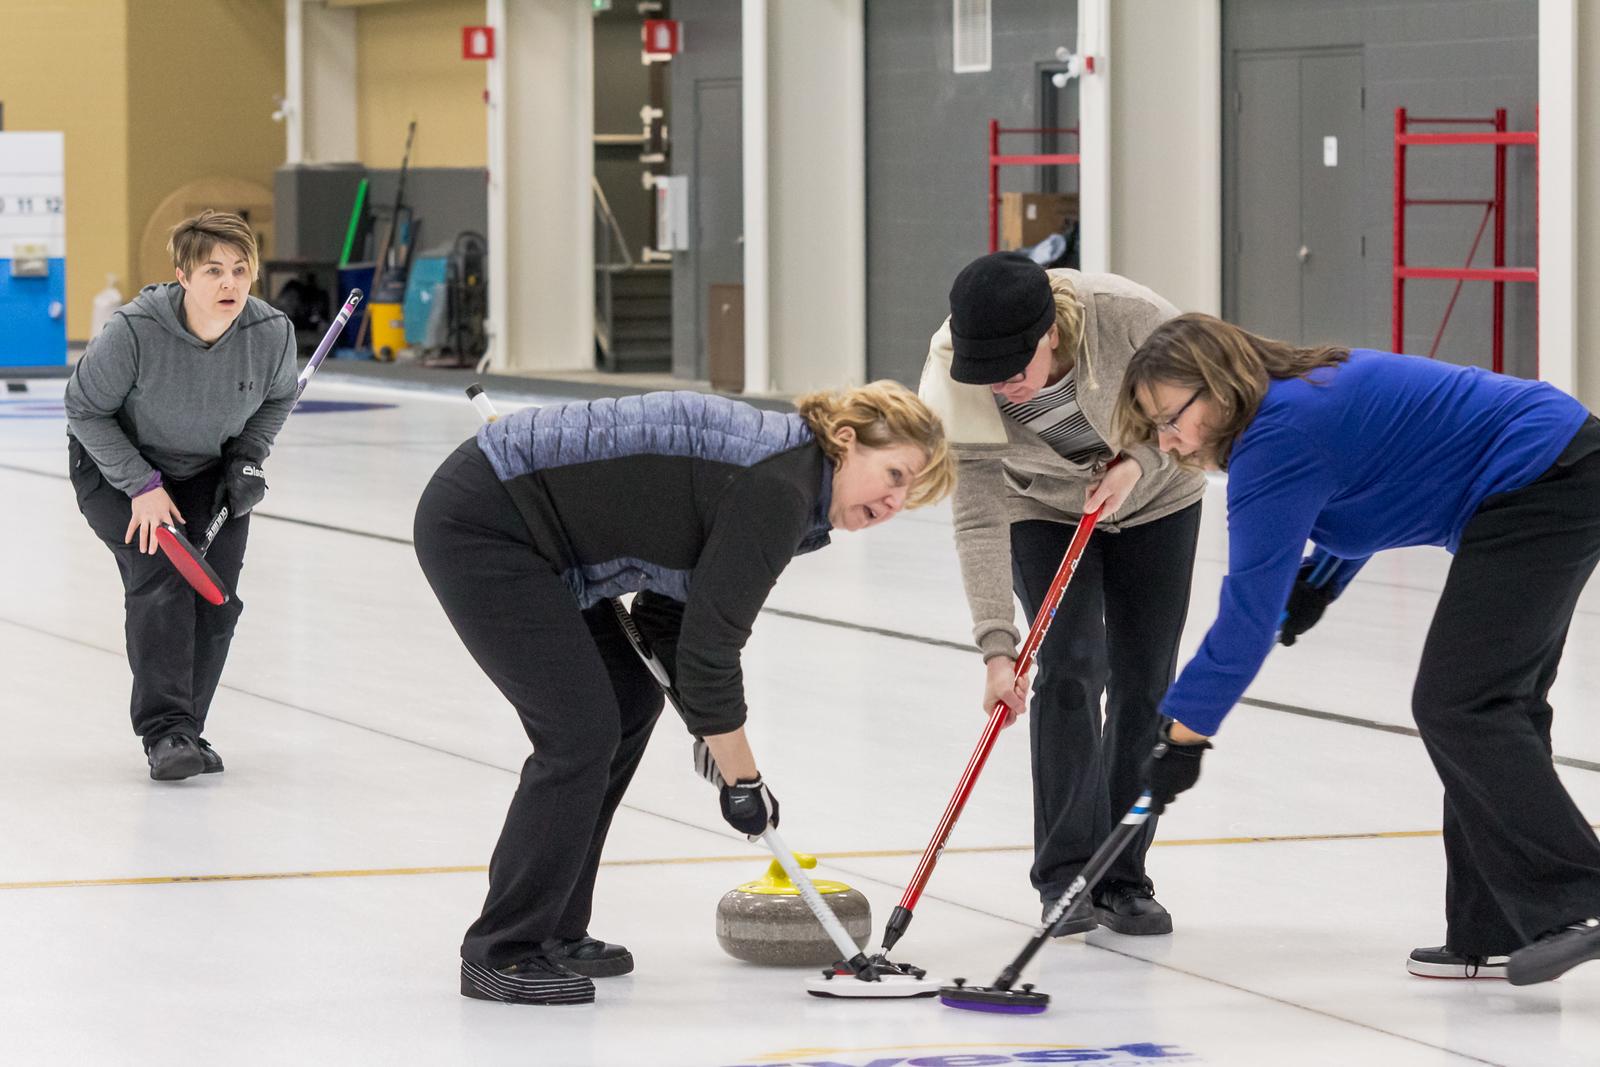 CurlingBonspeil2018-44